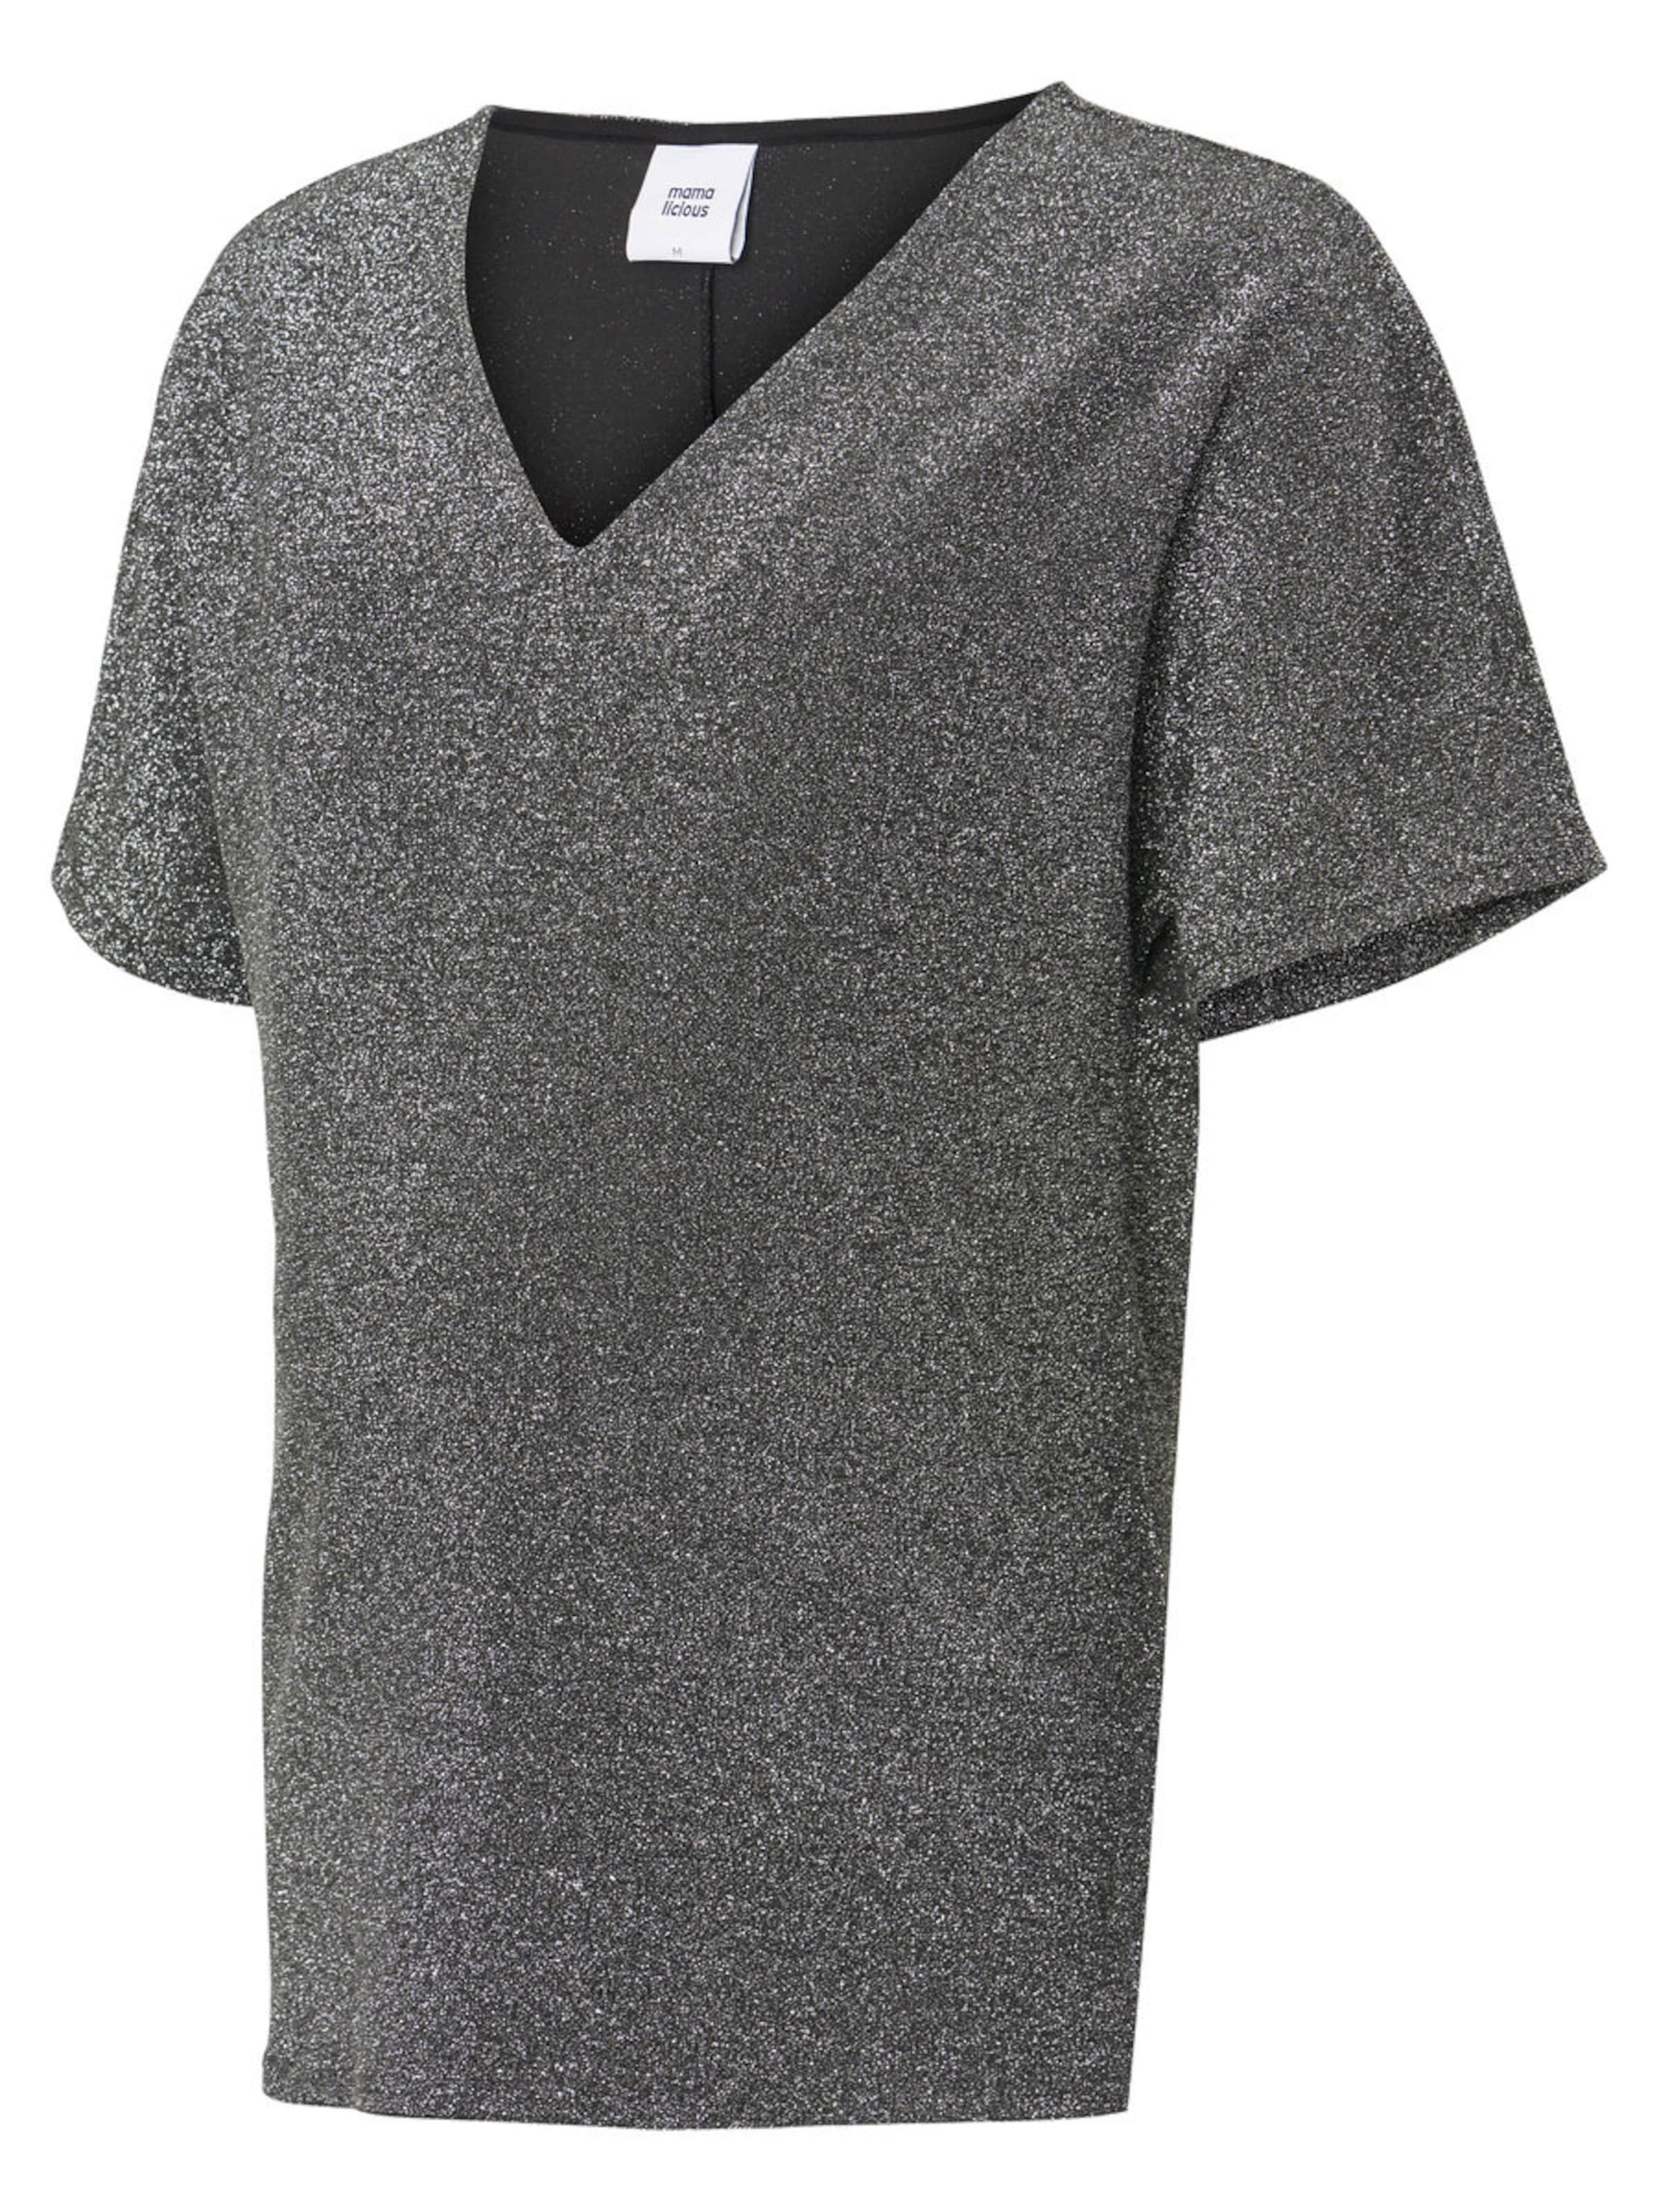 Gris T shirt Mamalicious Basalte En Y7vbfy6g